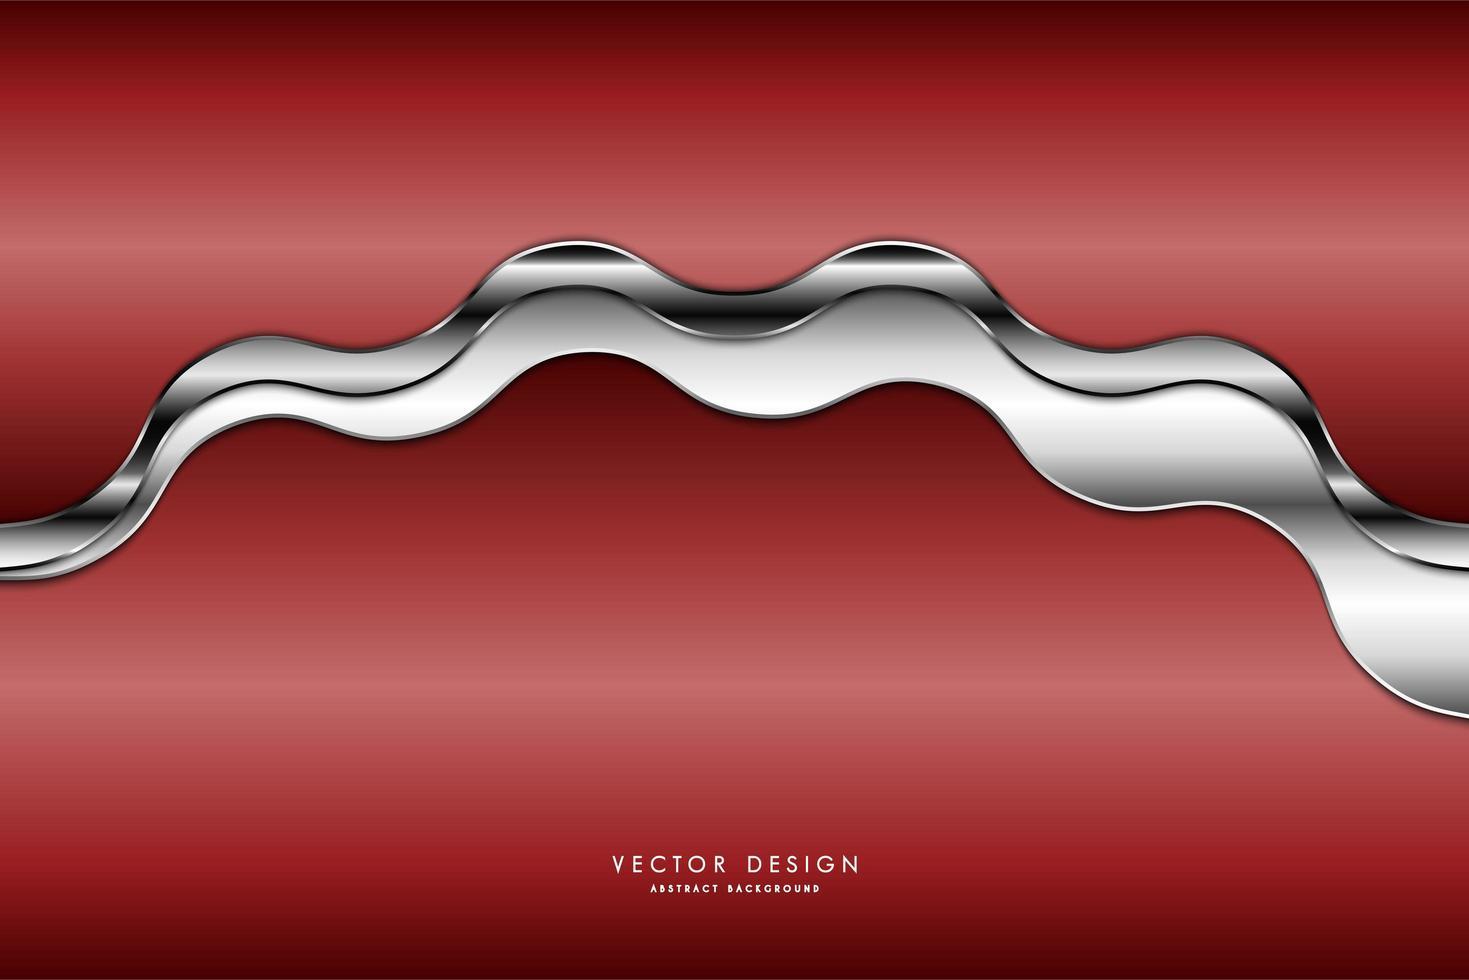 Wavy glossy silver plate running through metallic red gradient vector